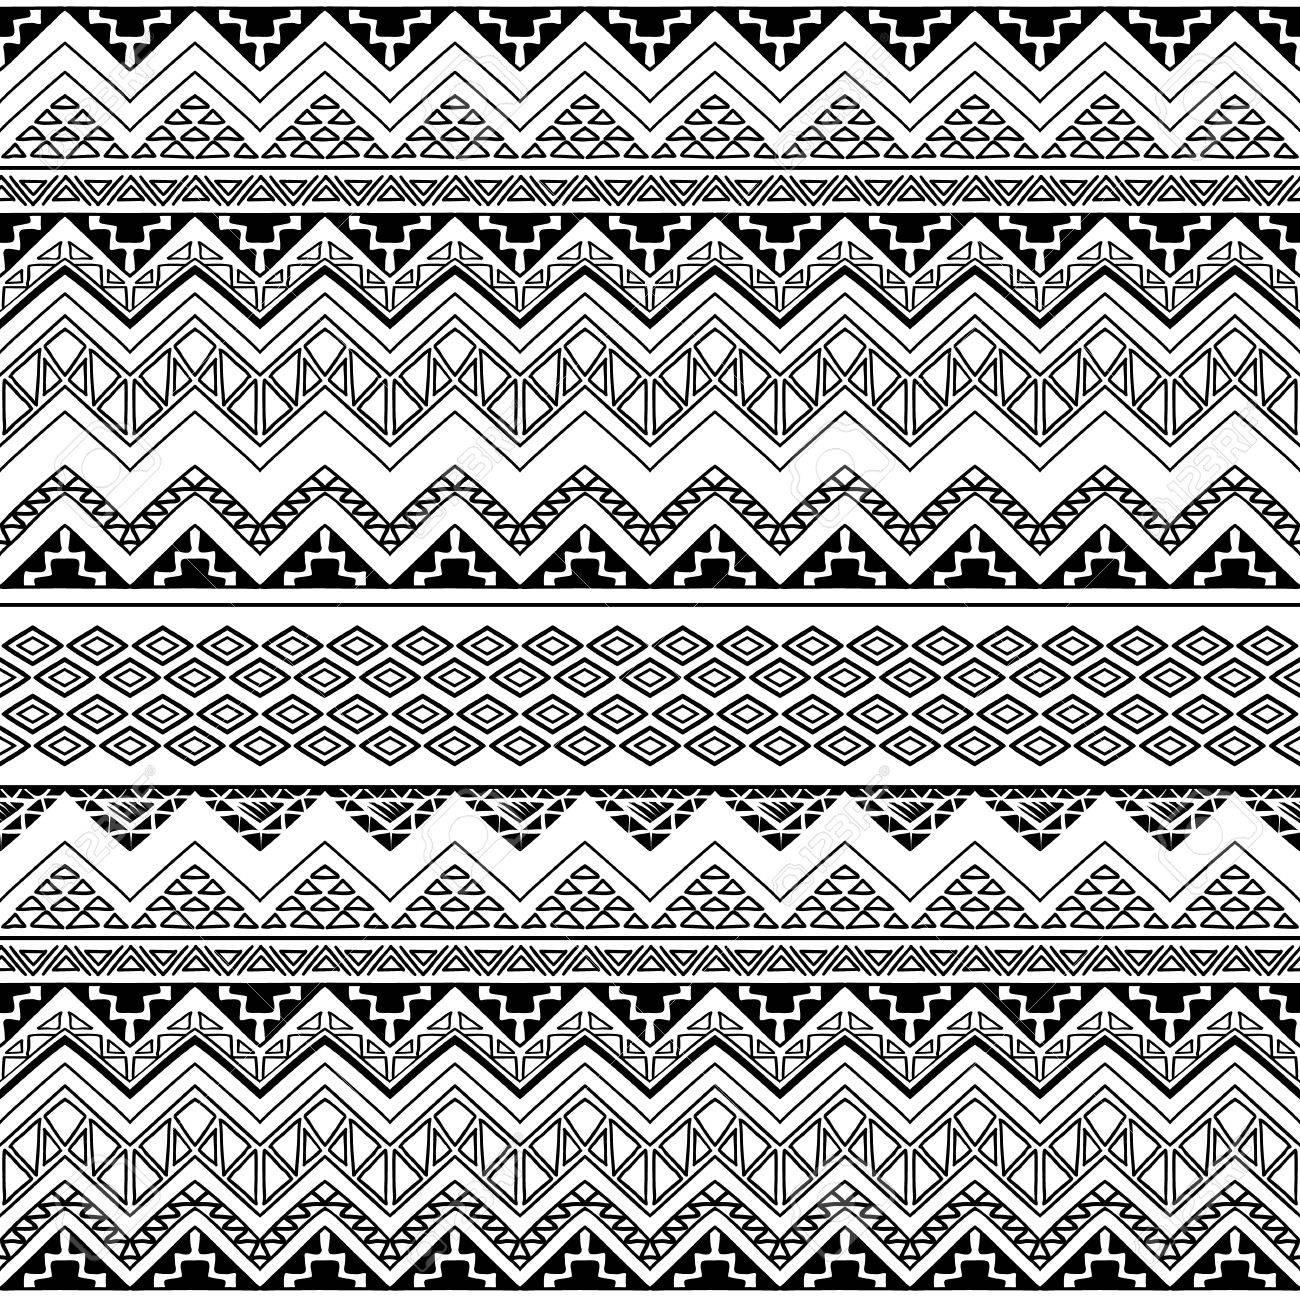 Seamless Boho Chic Style Pattern With Tribal Aztec Ornament Modern Folk Wallpaper Hand Drawn